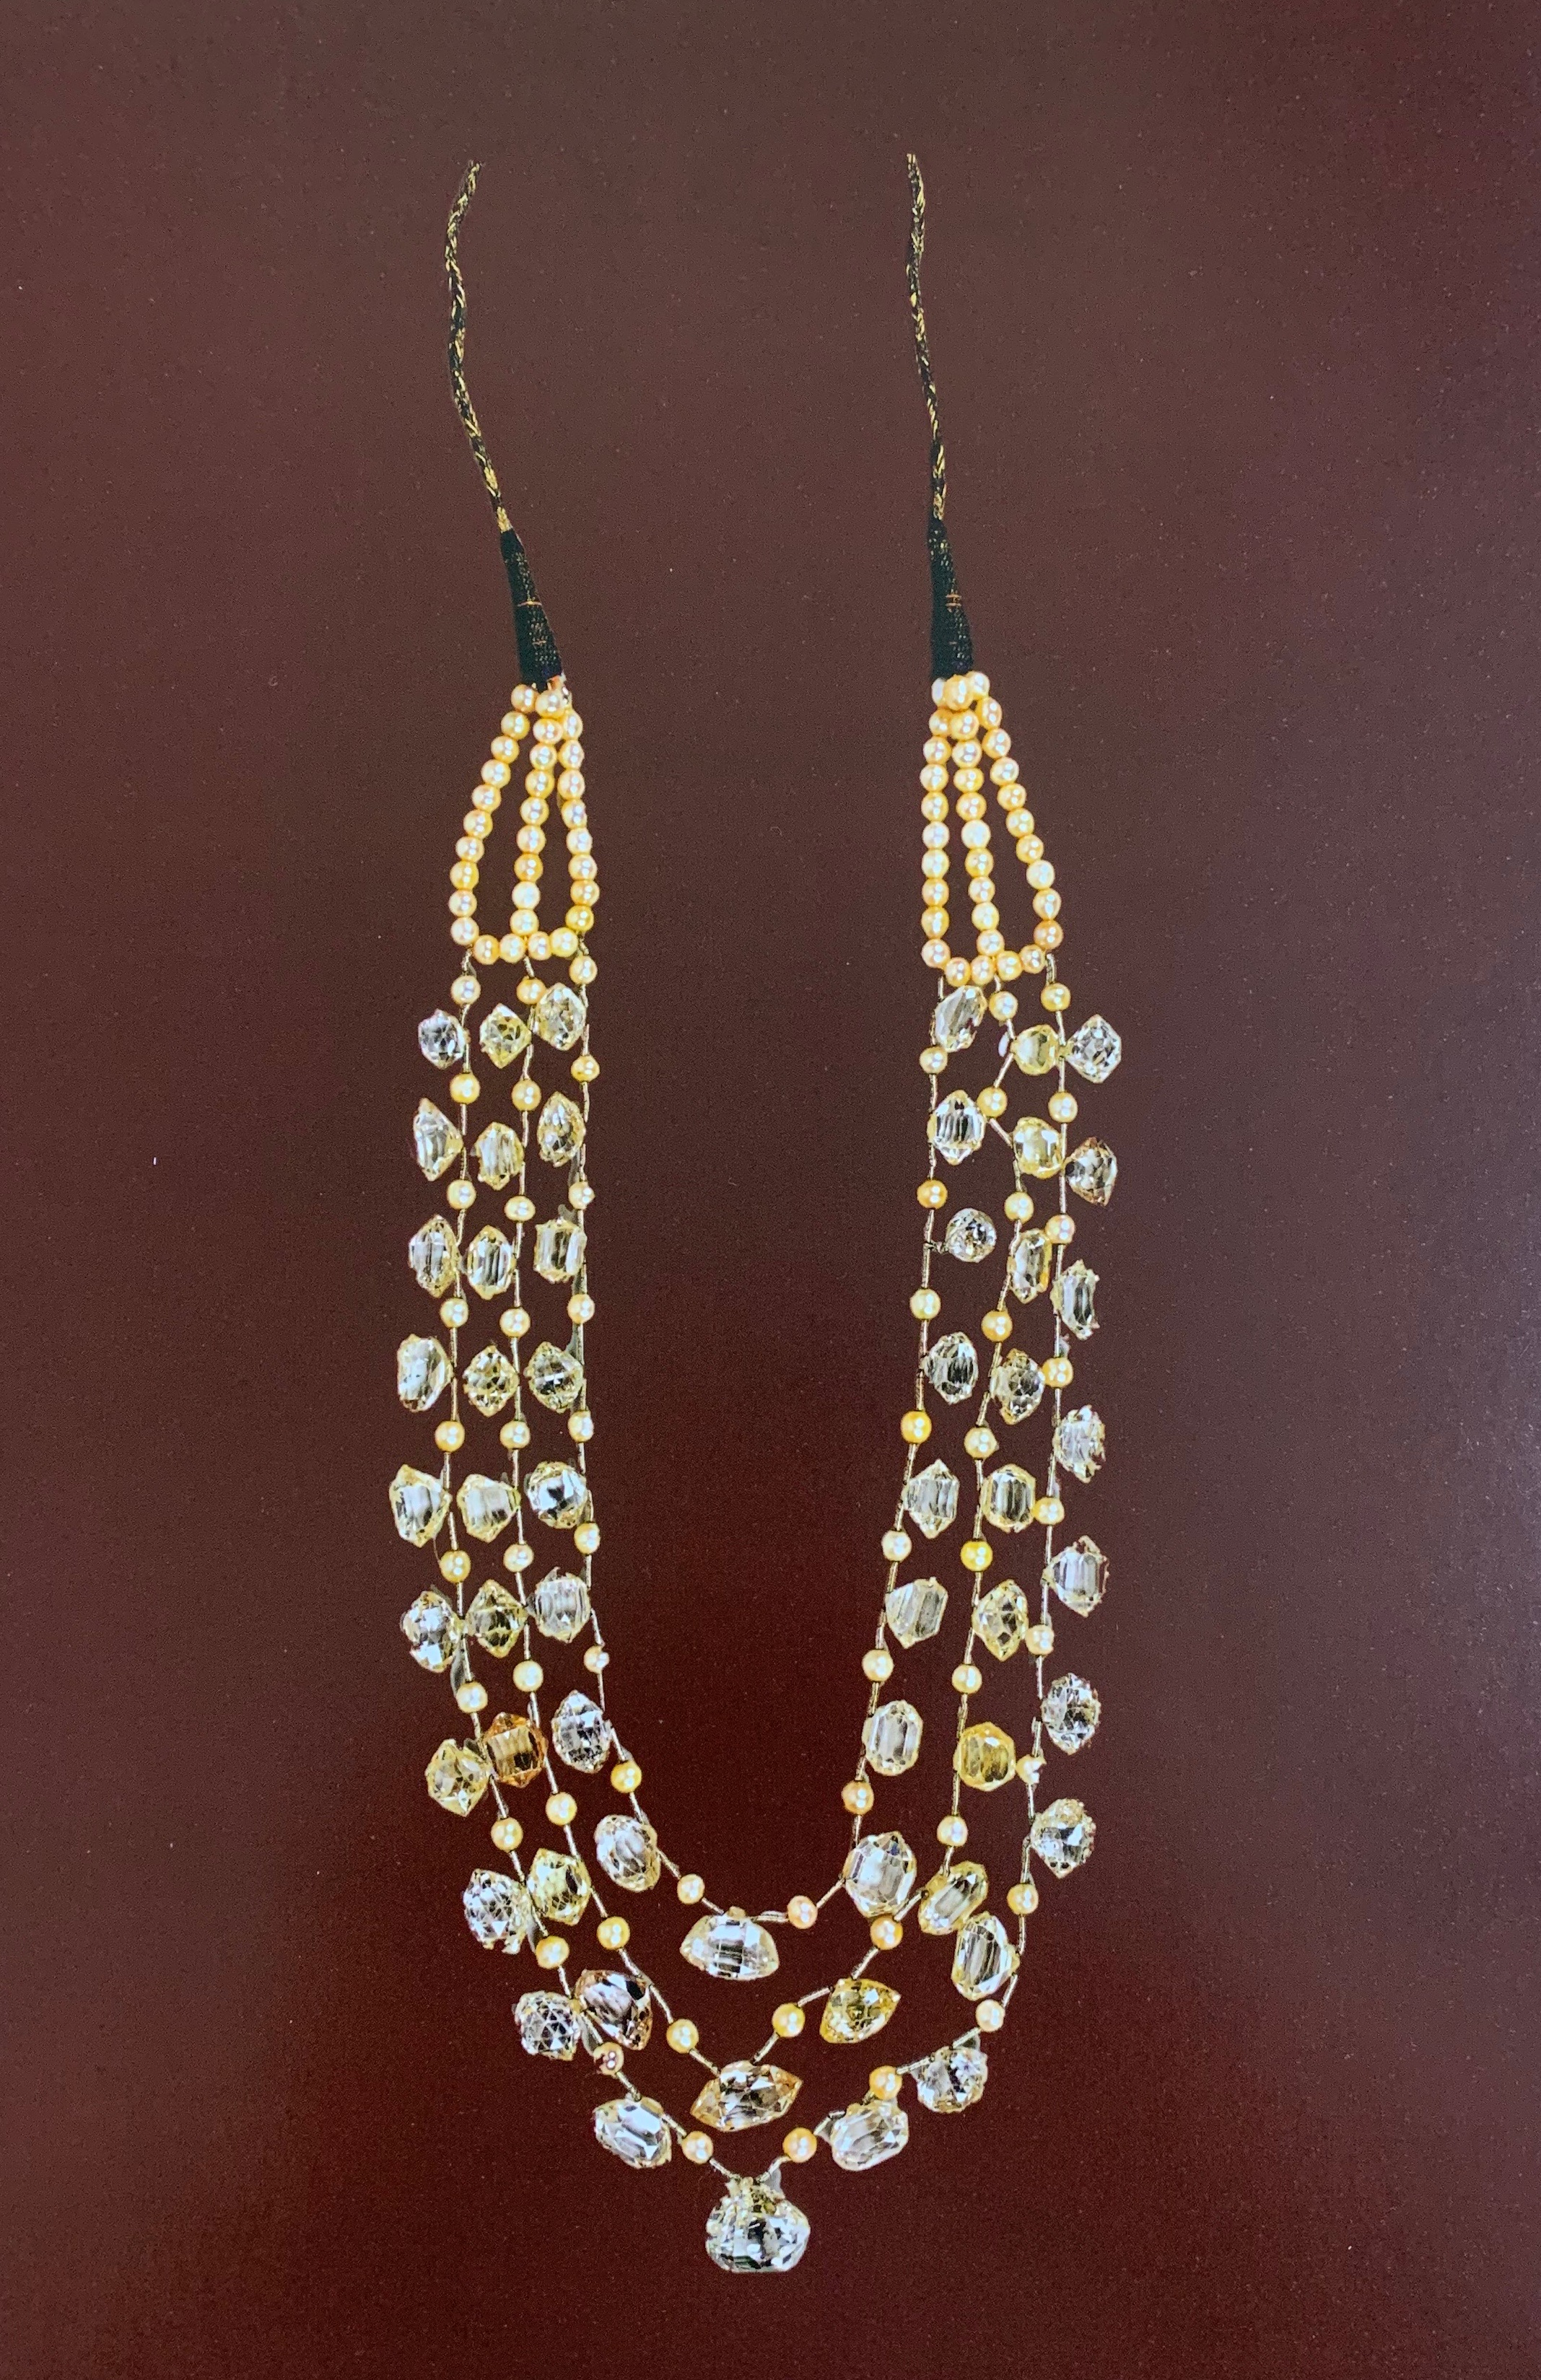 Kanthi Dolna Almas Wa Mothi -- Necklace of diamond beads strung with pearls